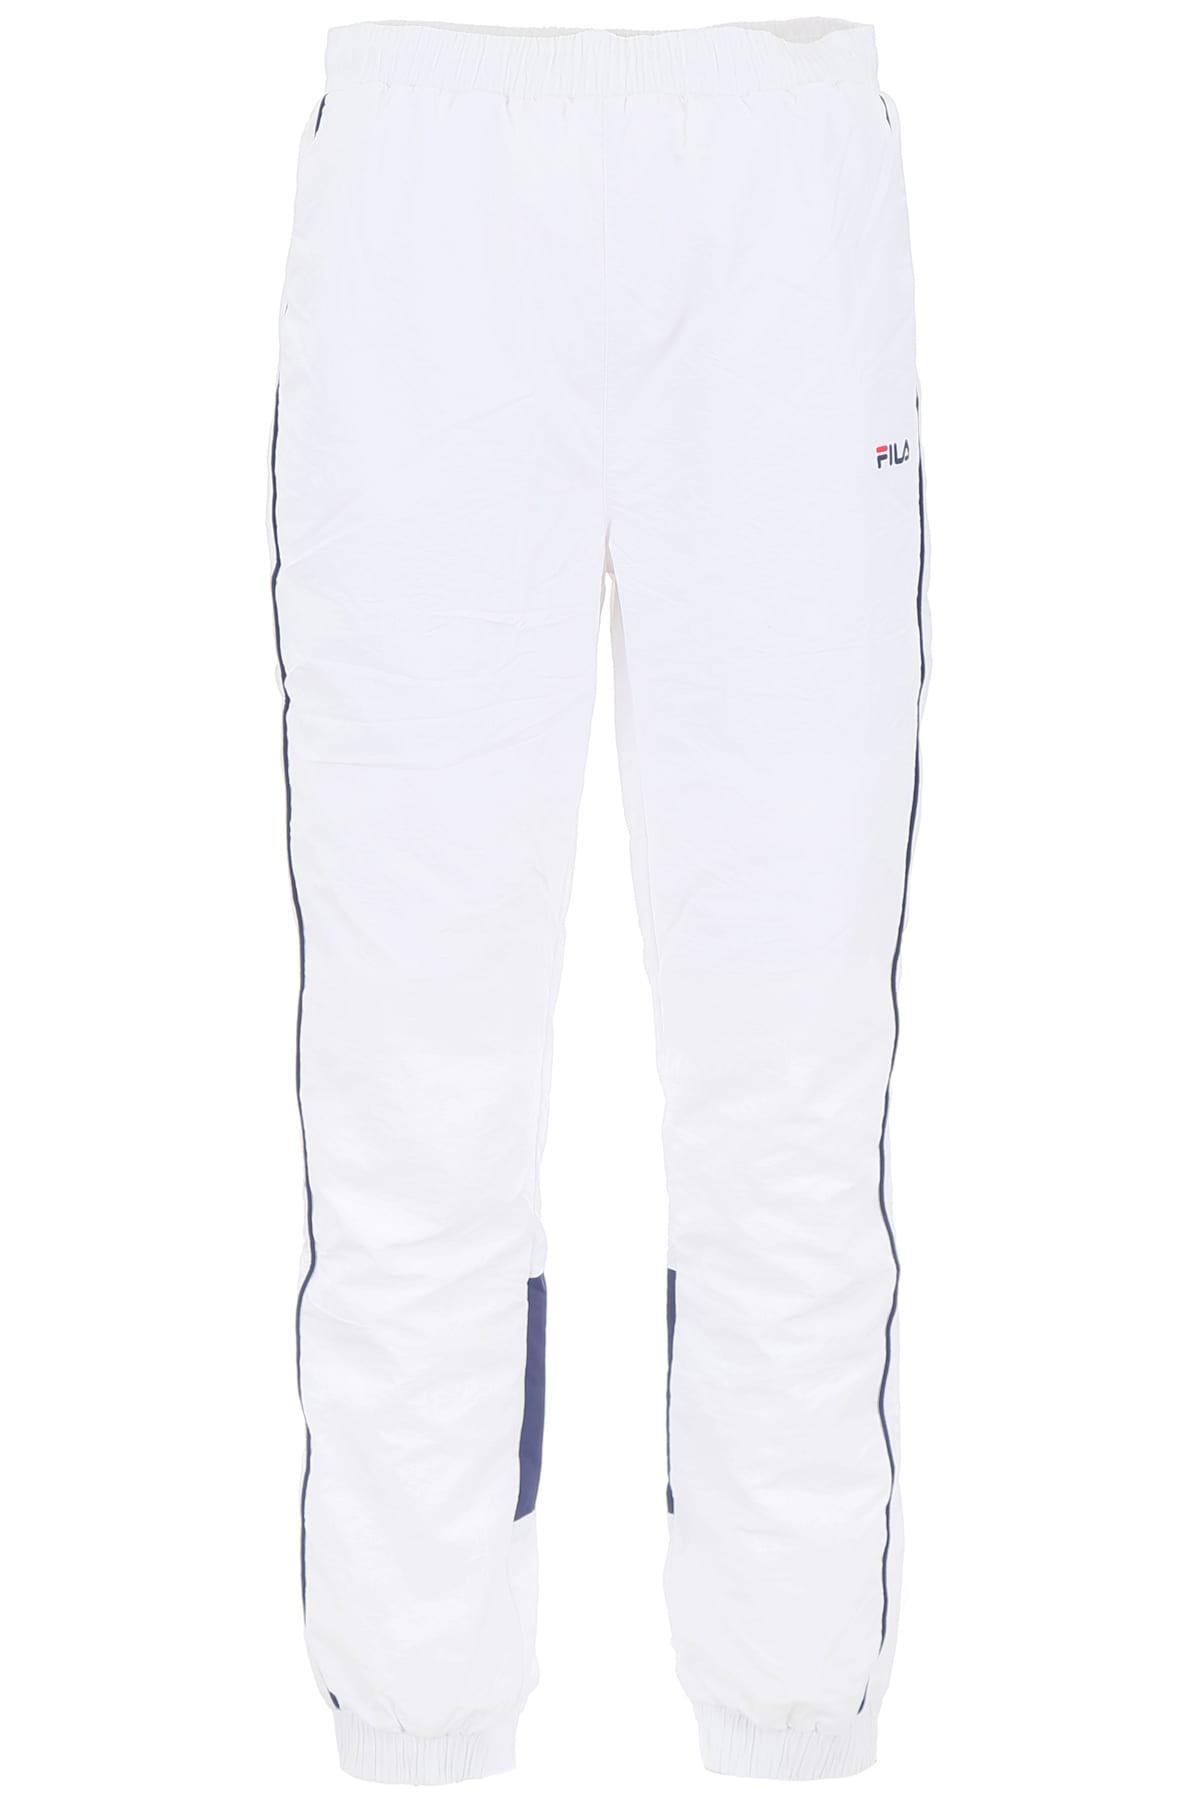 Fila Talmon Trousers